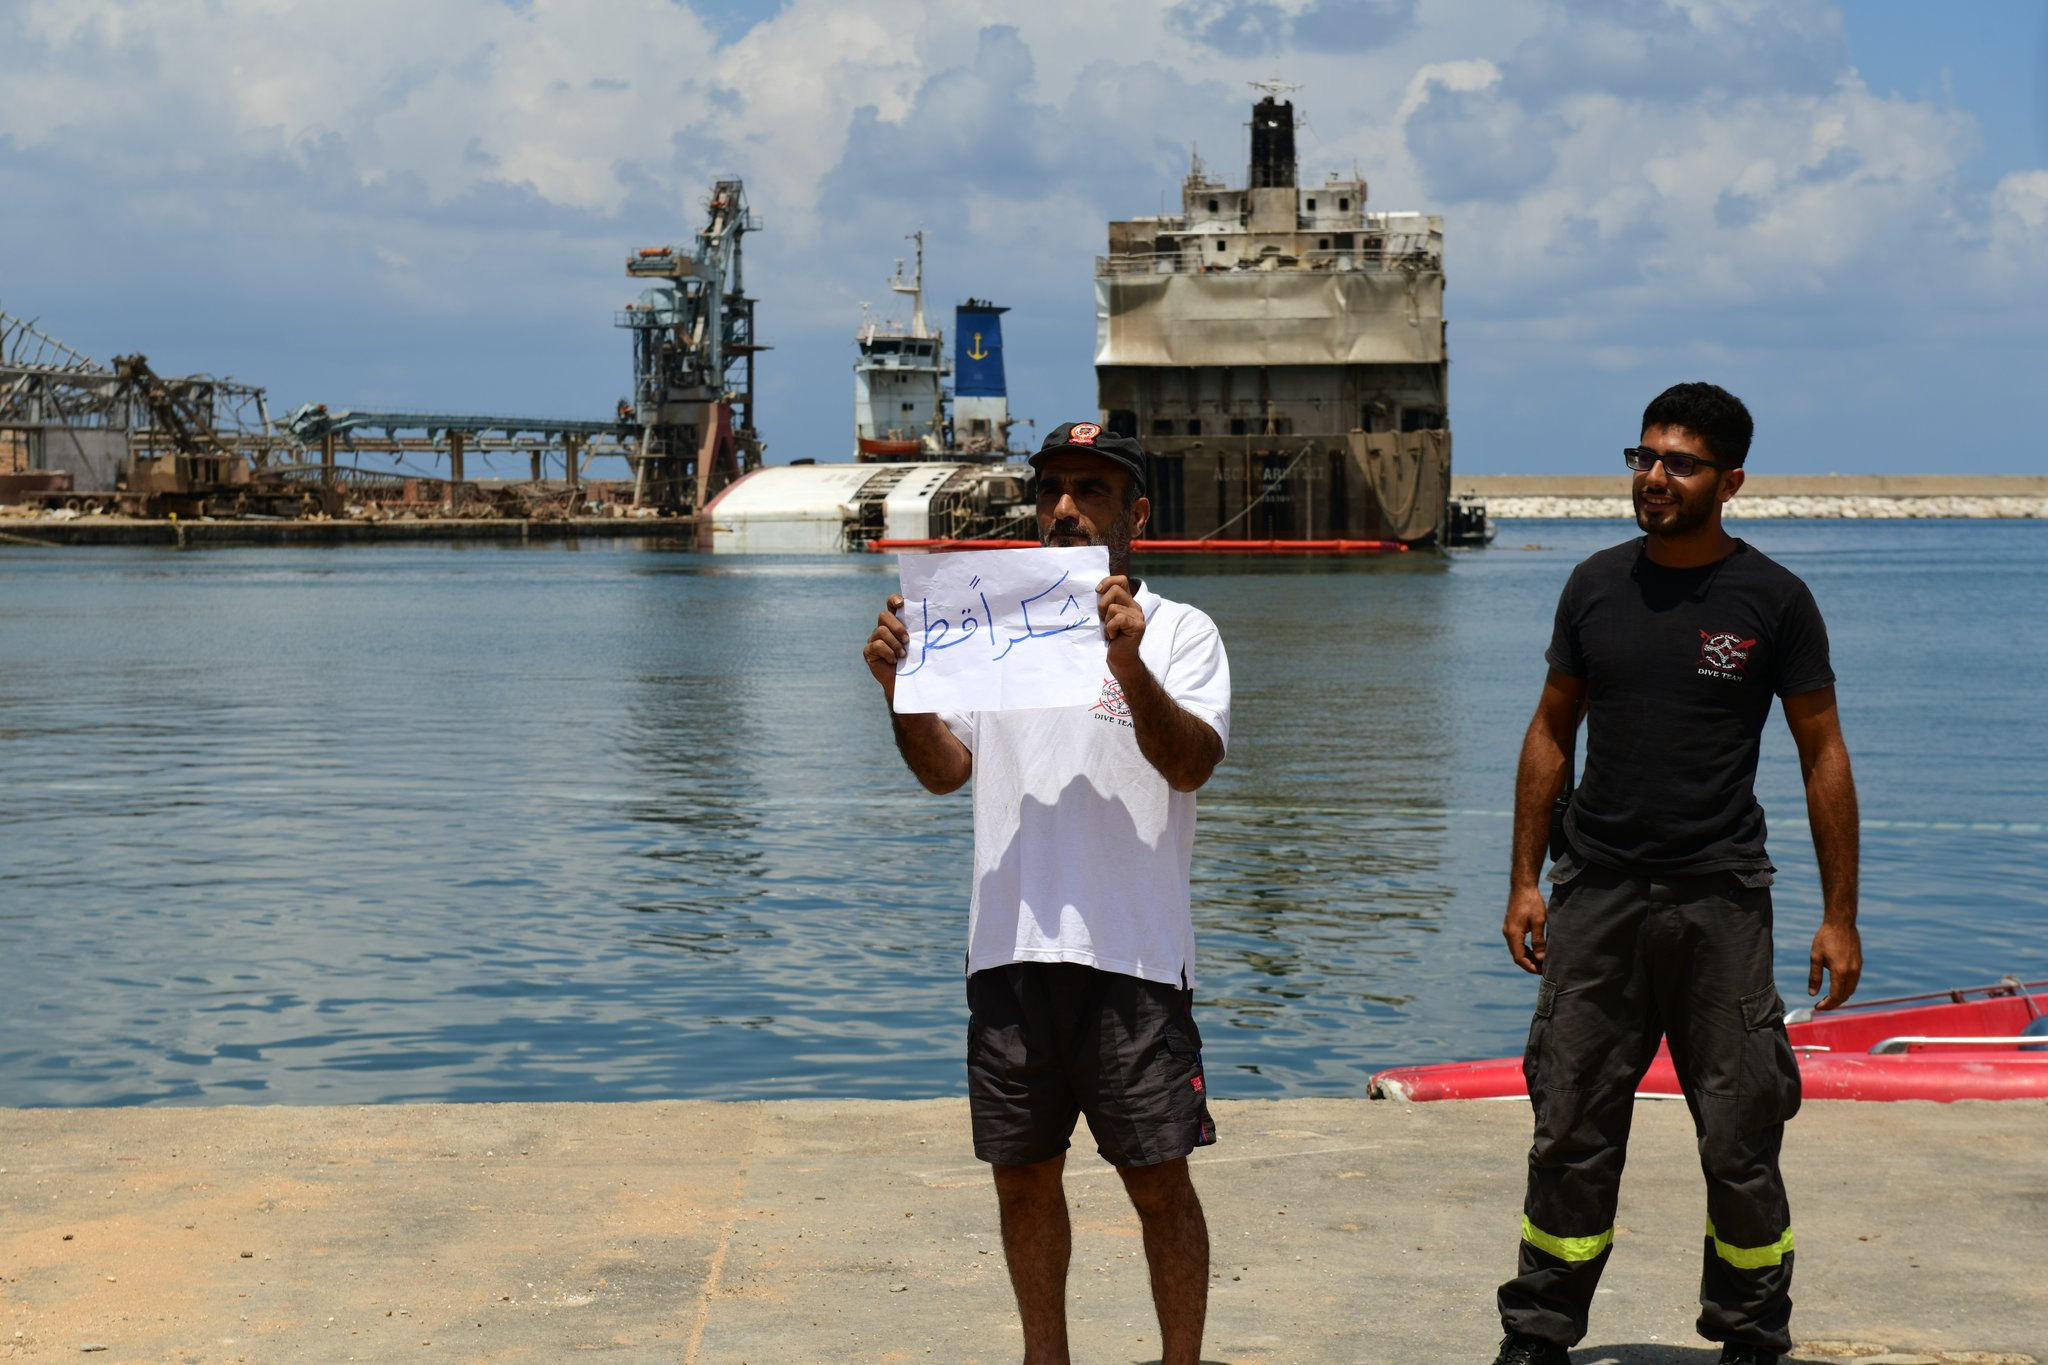 Ambassador visits Qatari search and rescue team at Beirut Port explosion site